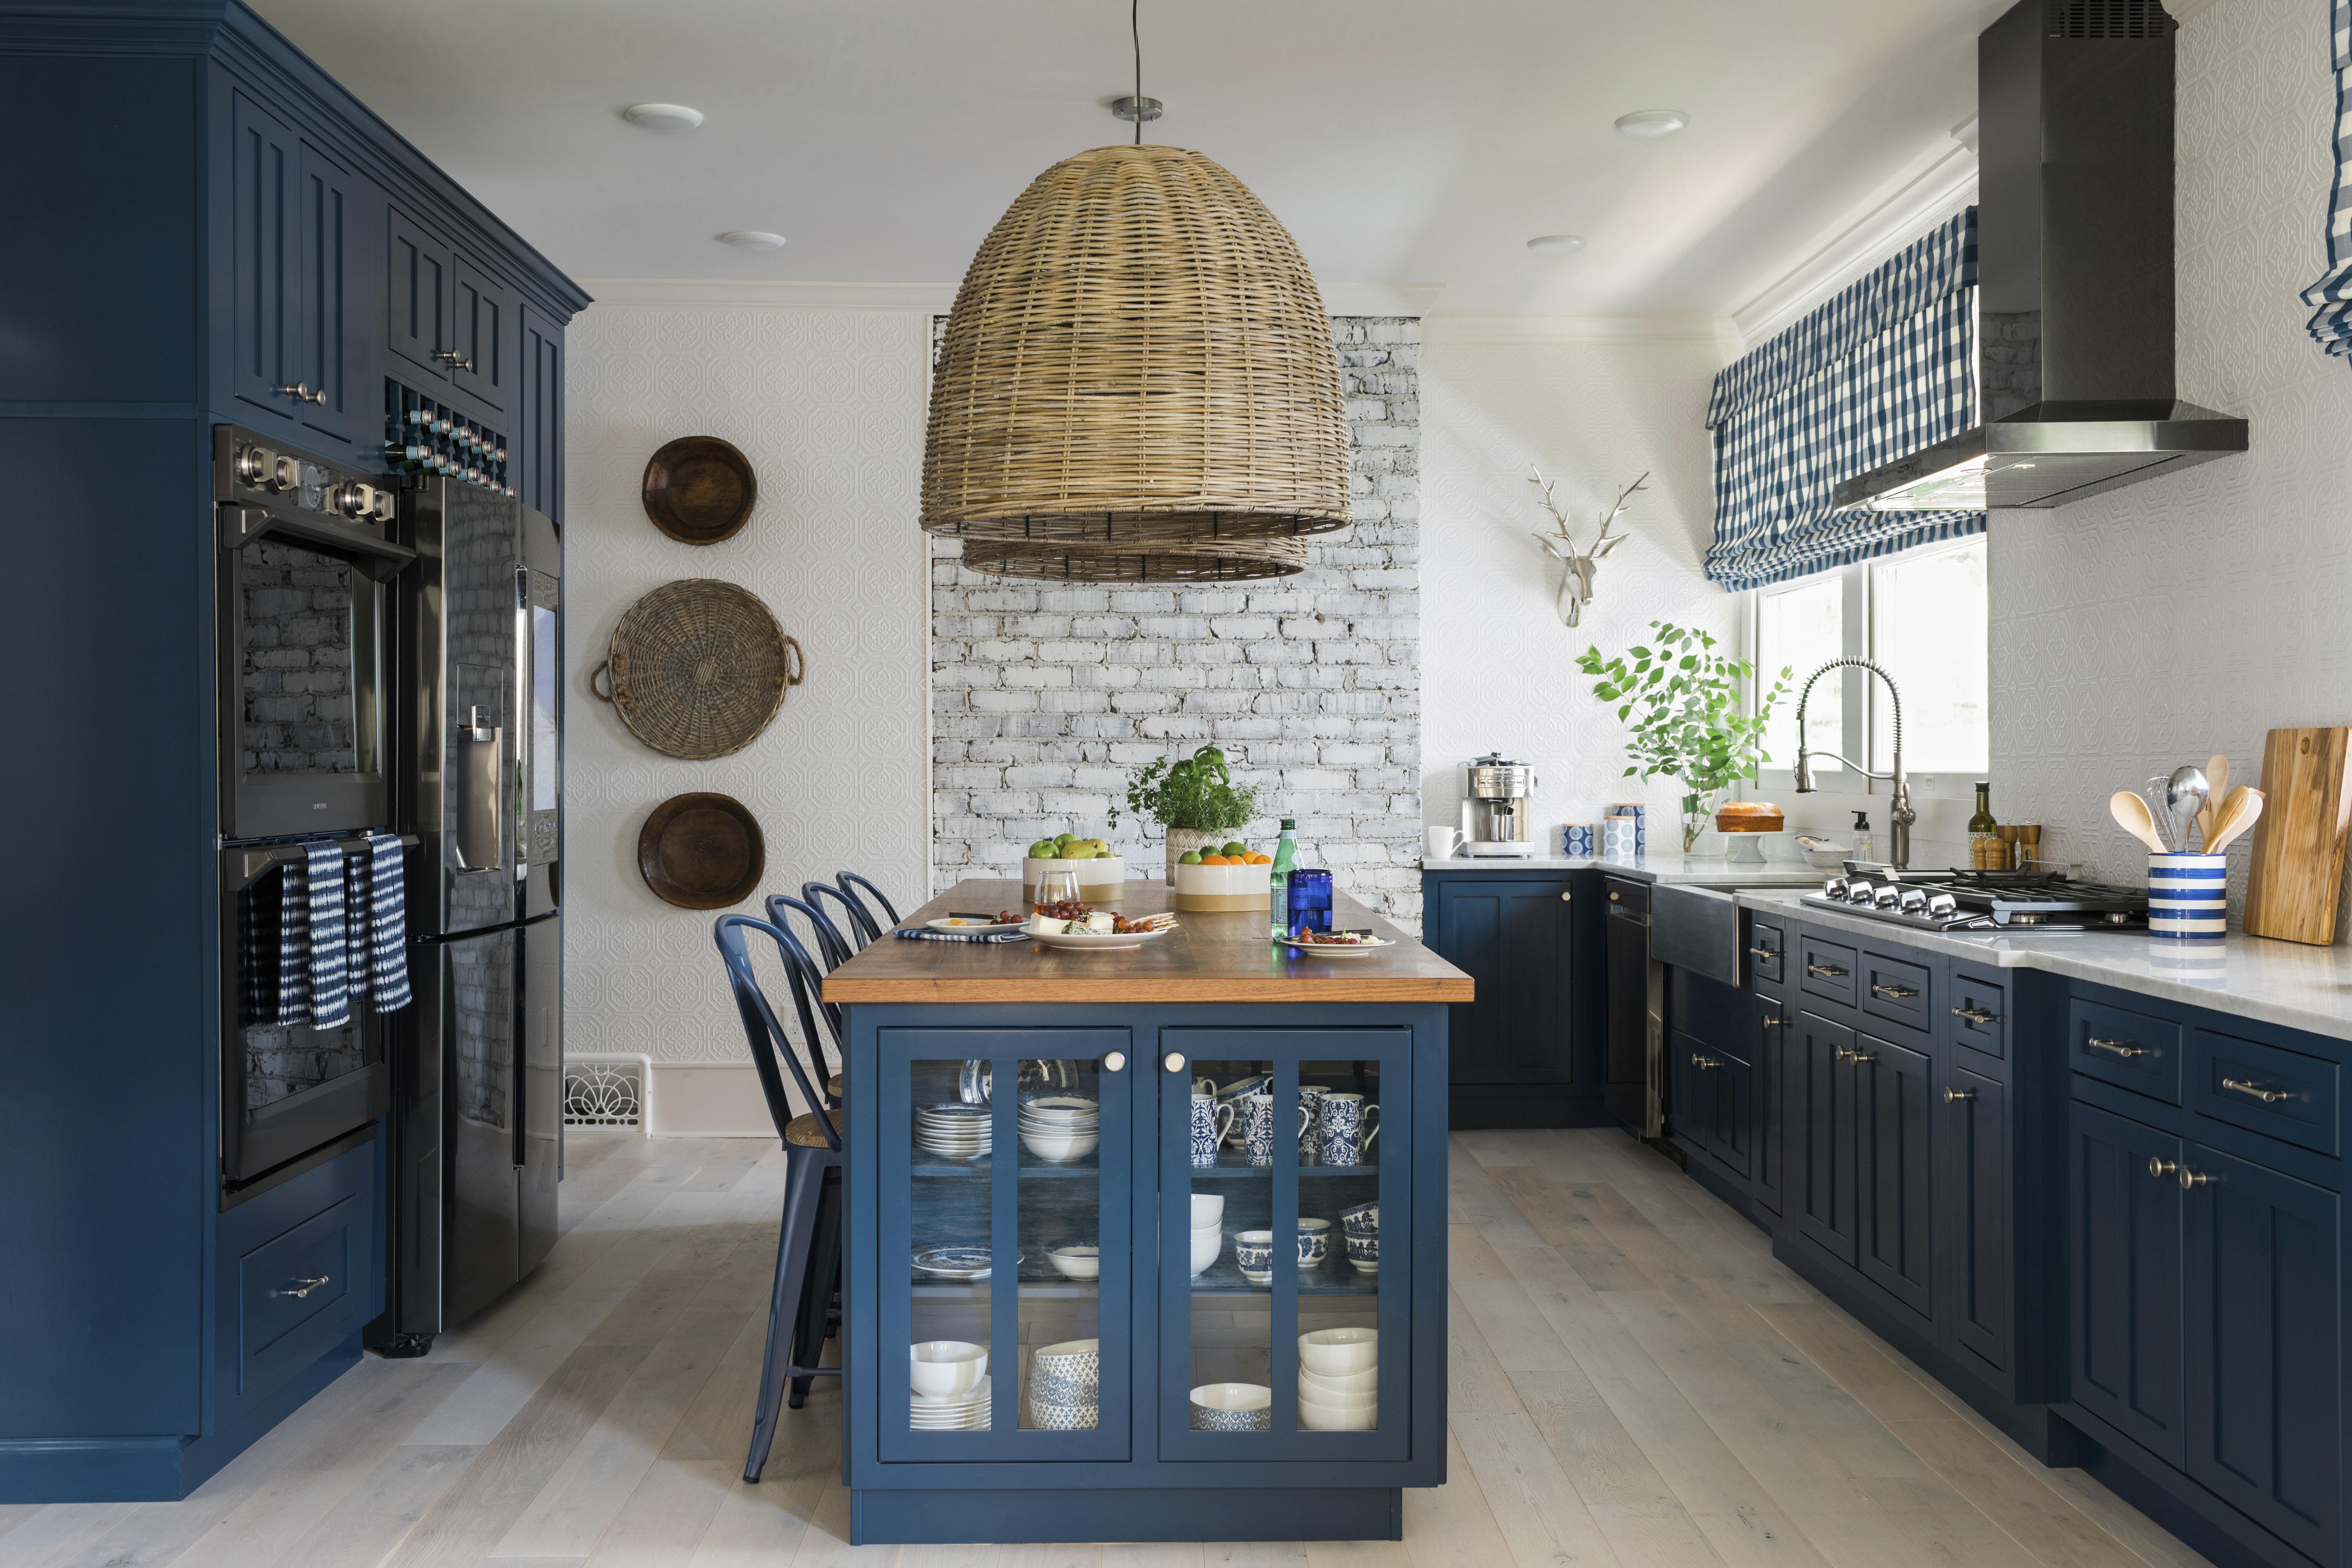 kitchen to go cabinets red backsplash being bold for color on